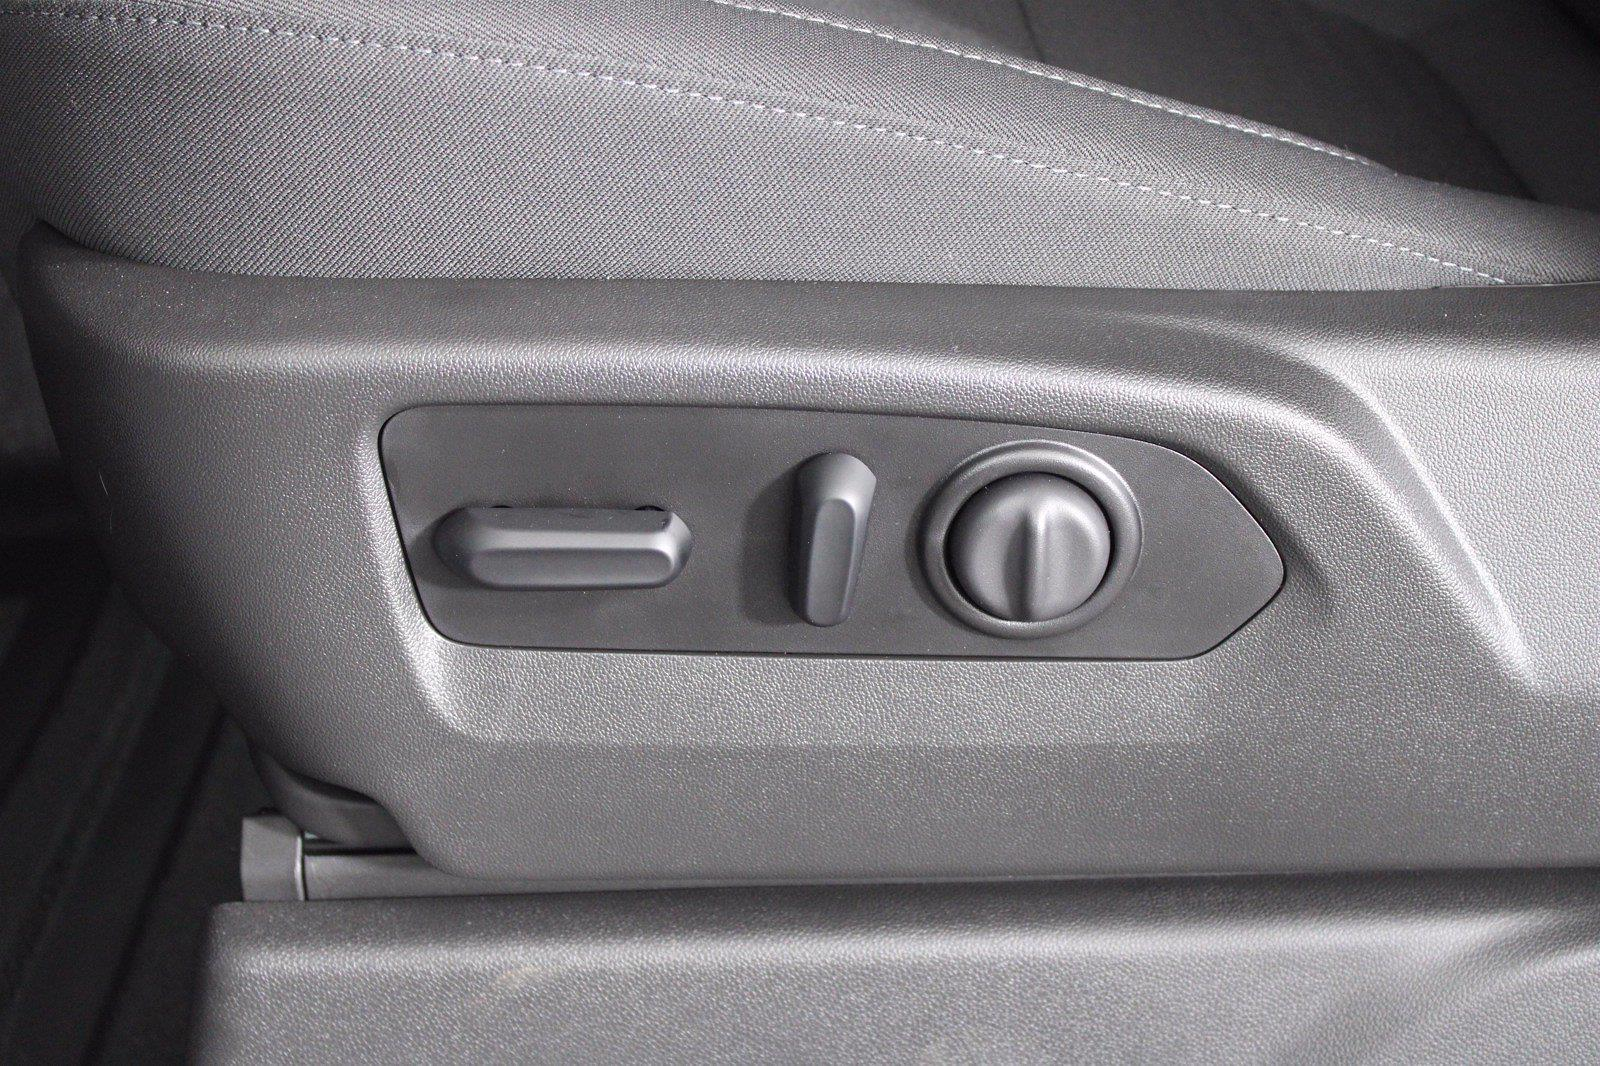 2022 Silverado 2500 Regular Cab 4x4,  Pickup #D120020 - photo 14